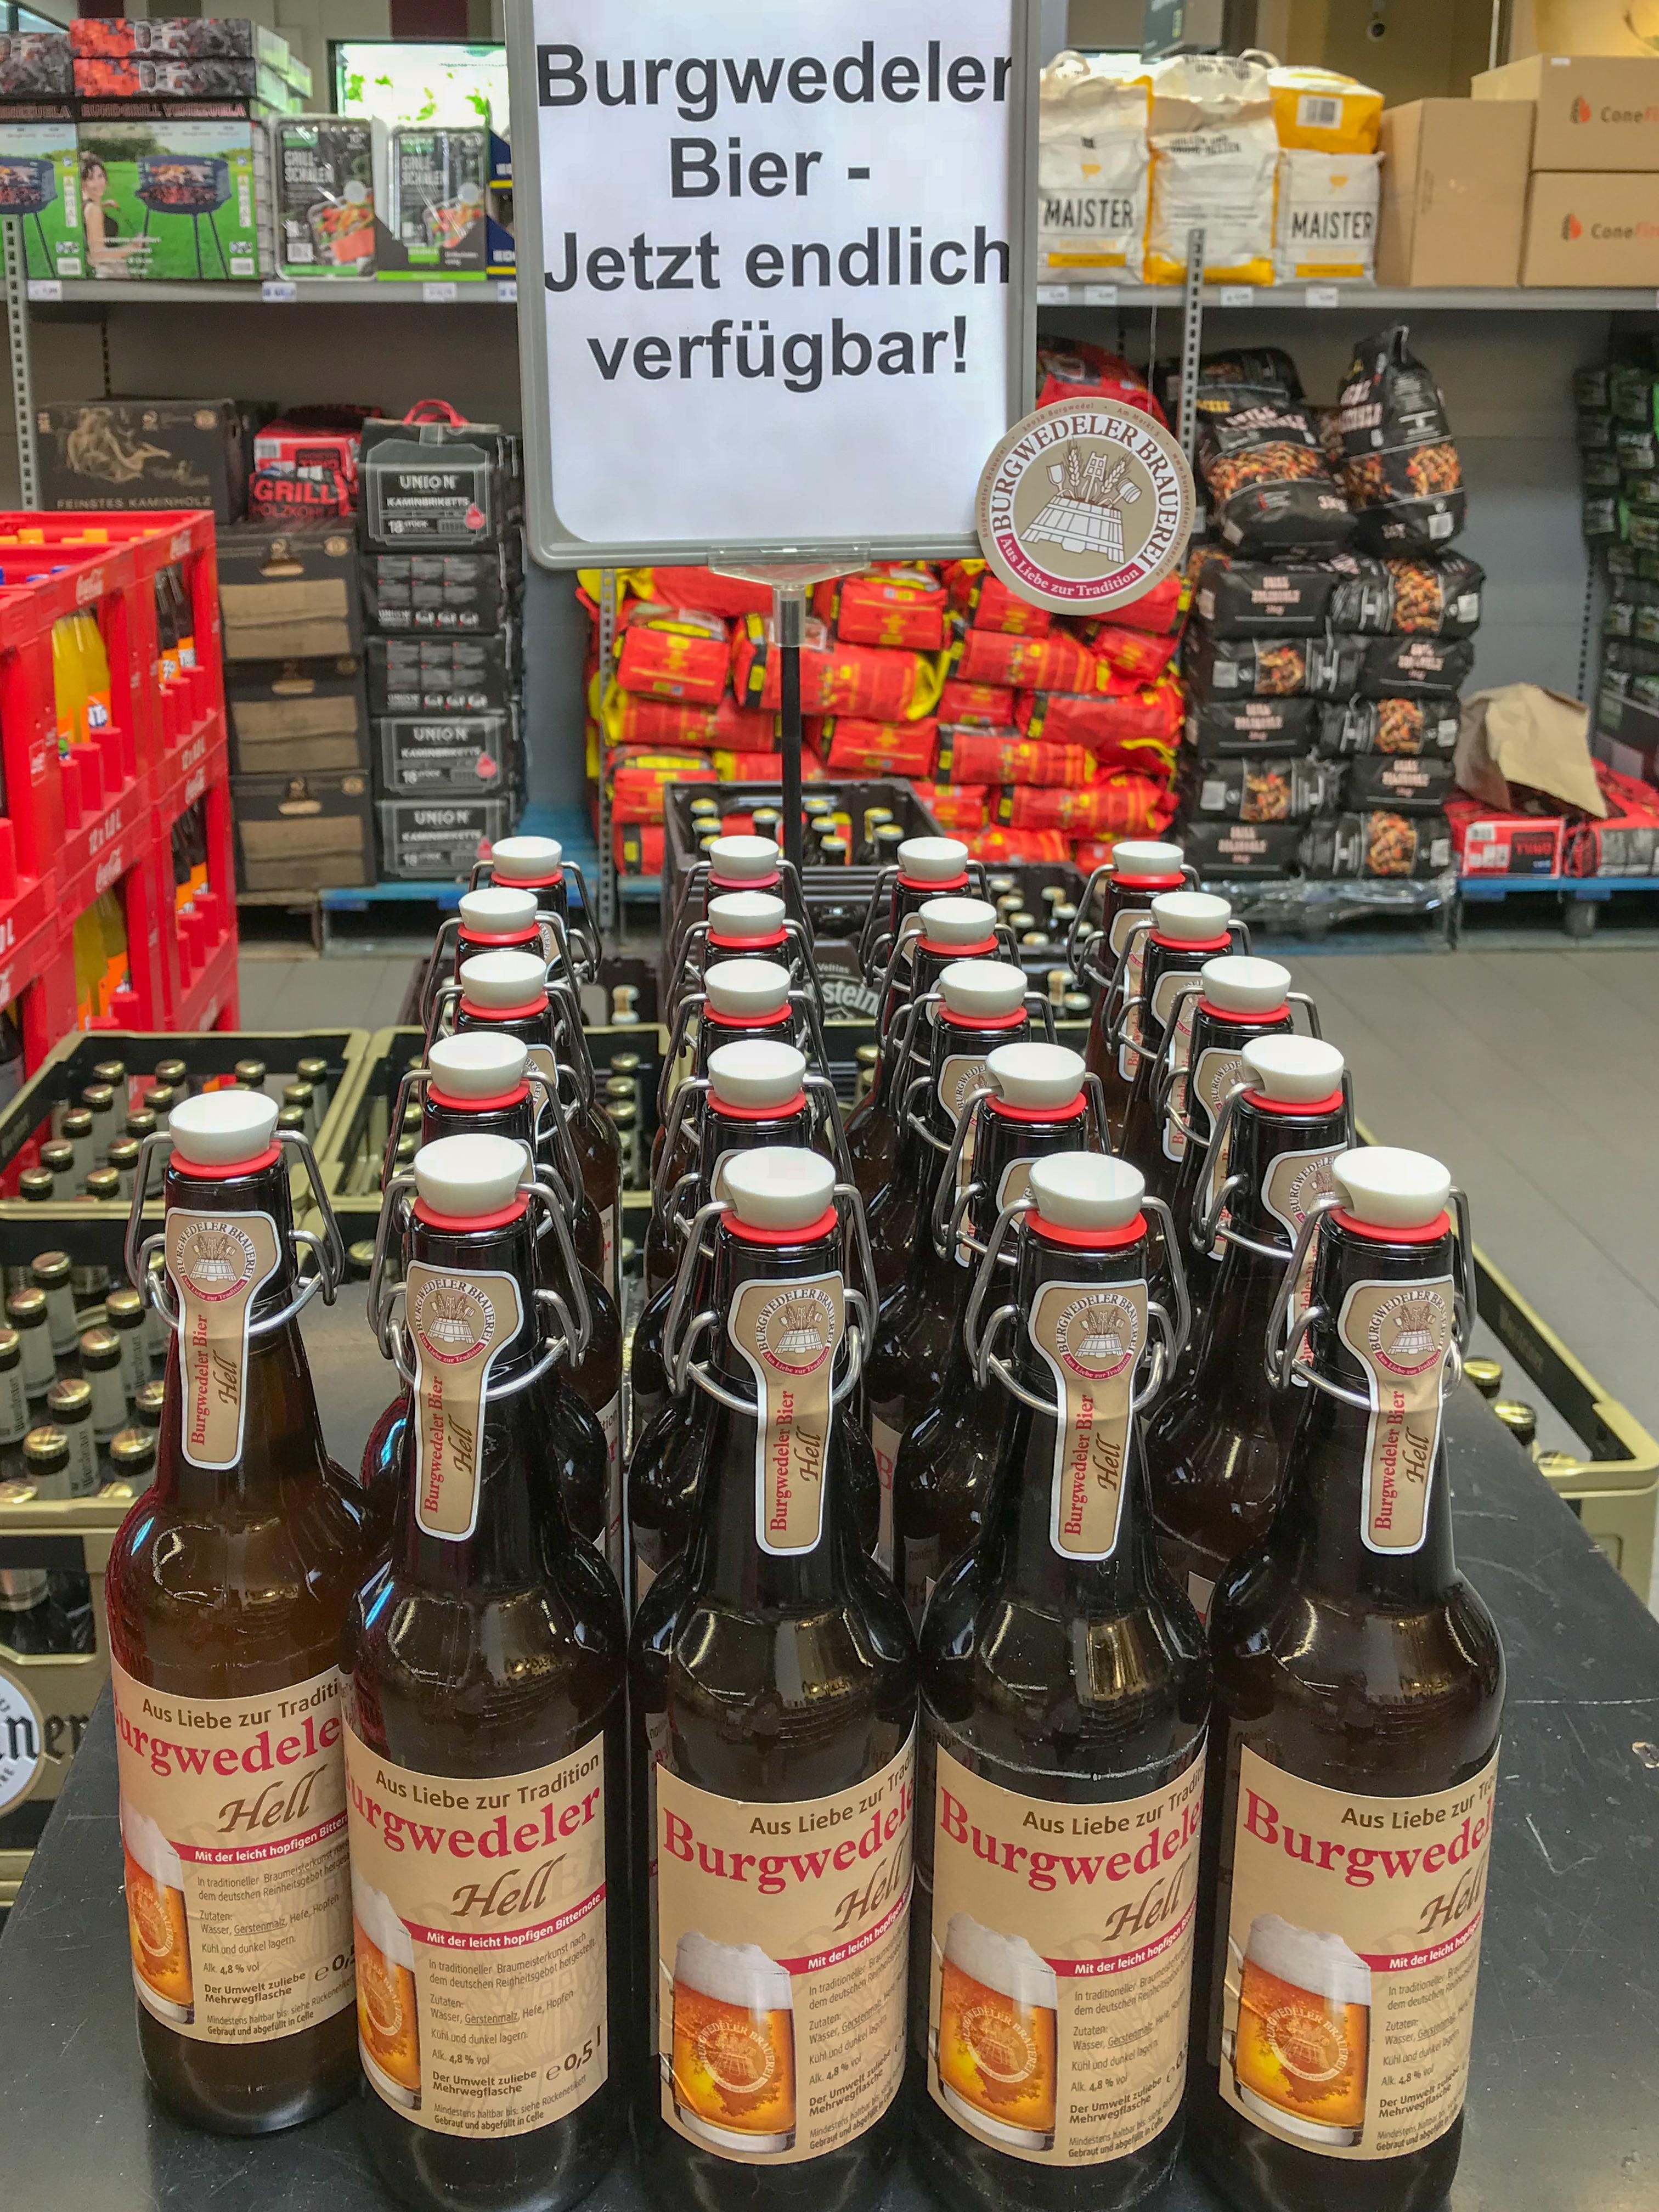 Burgwedeler Bier Bei Edeka Cramer Wib Burgwedel